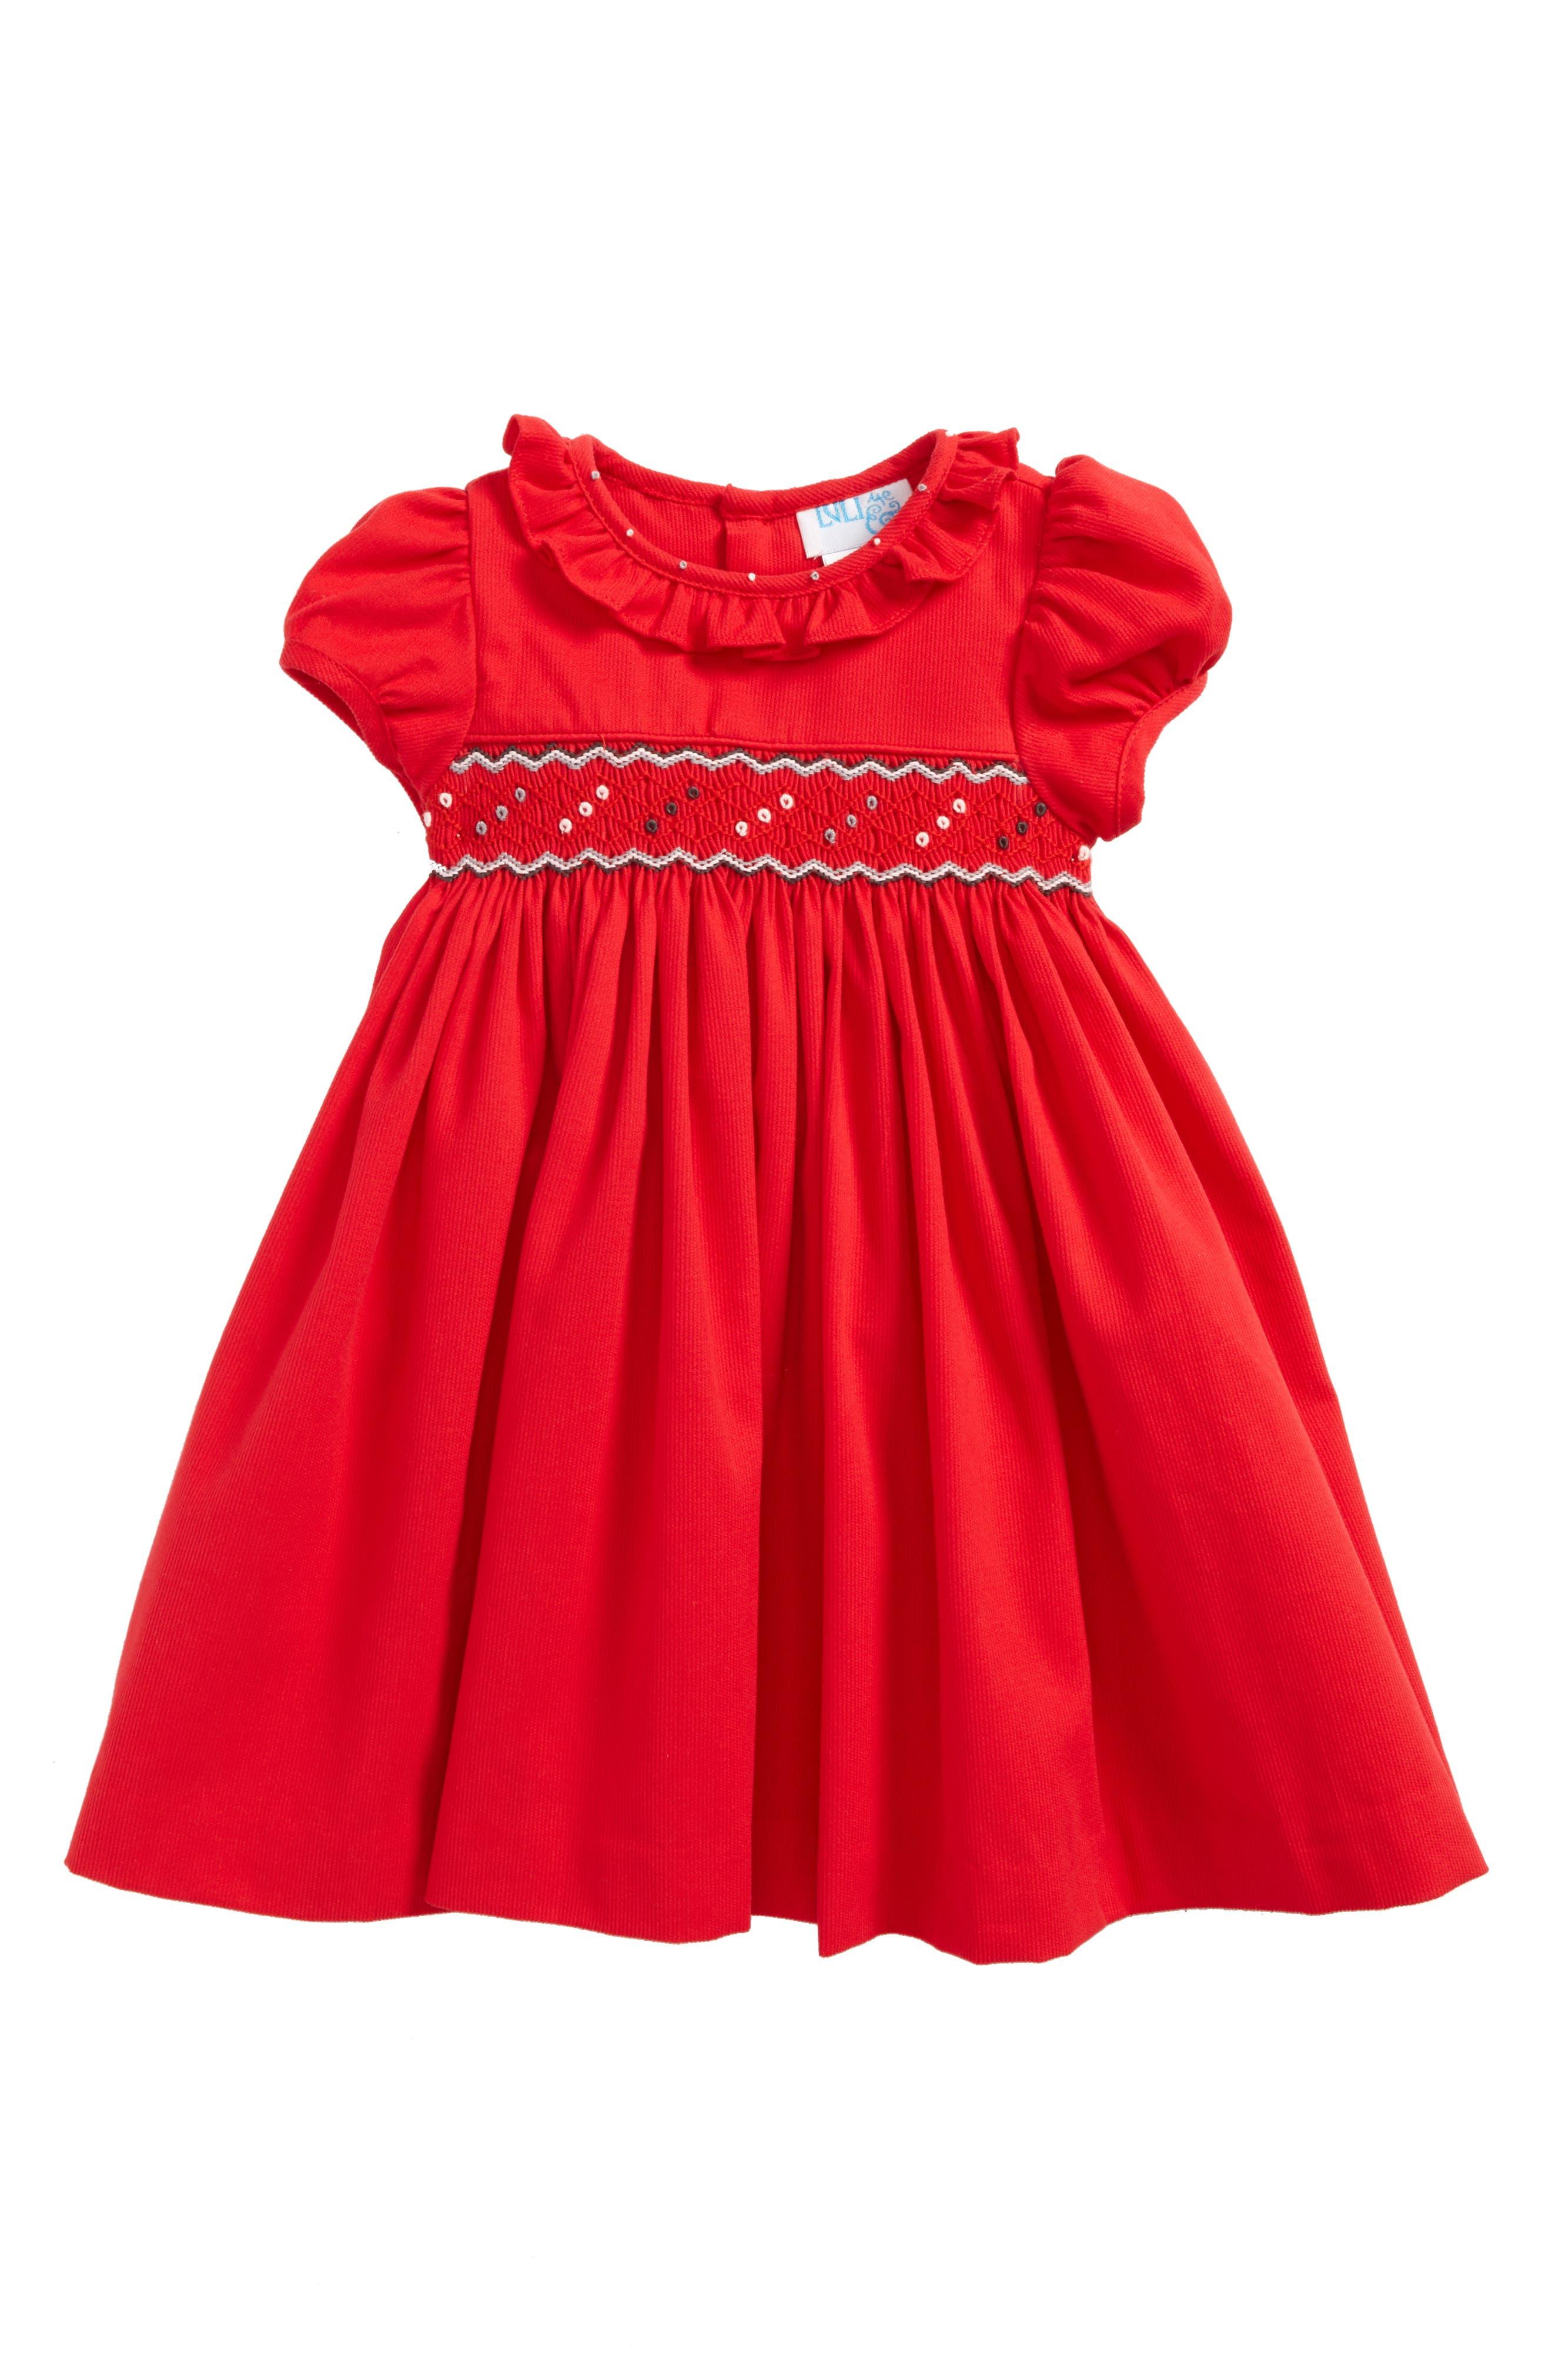 Smocked Dress,                             Main thumbnail 1, color,                             Red